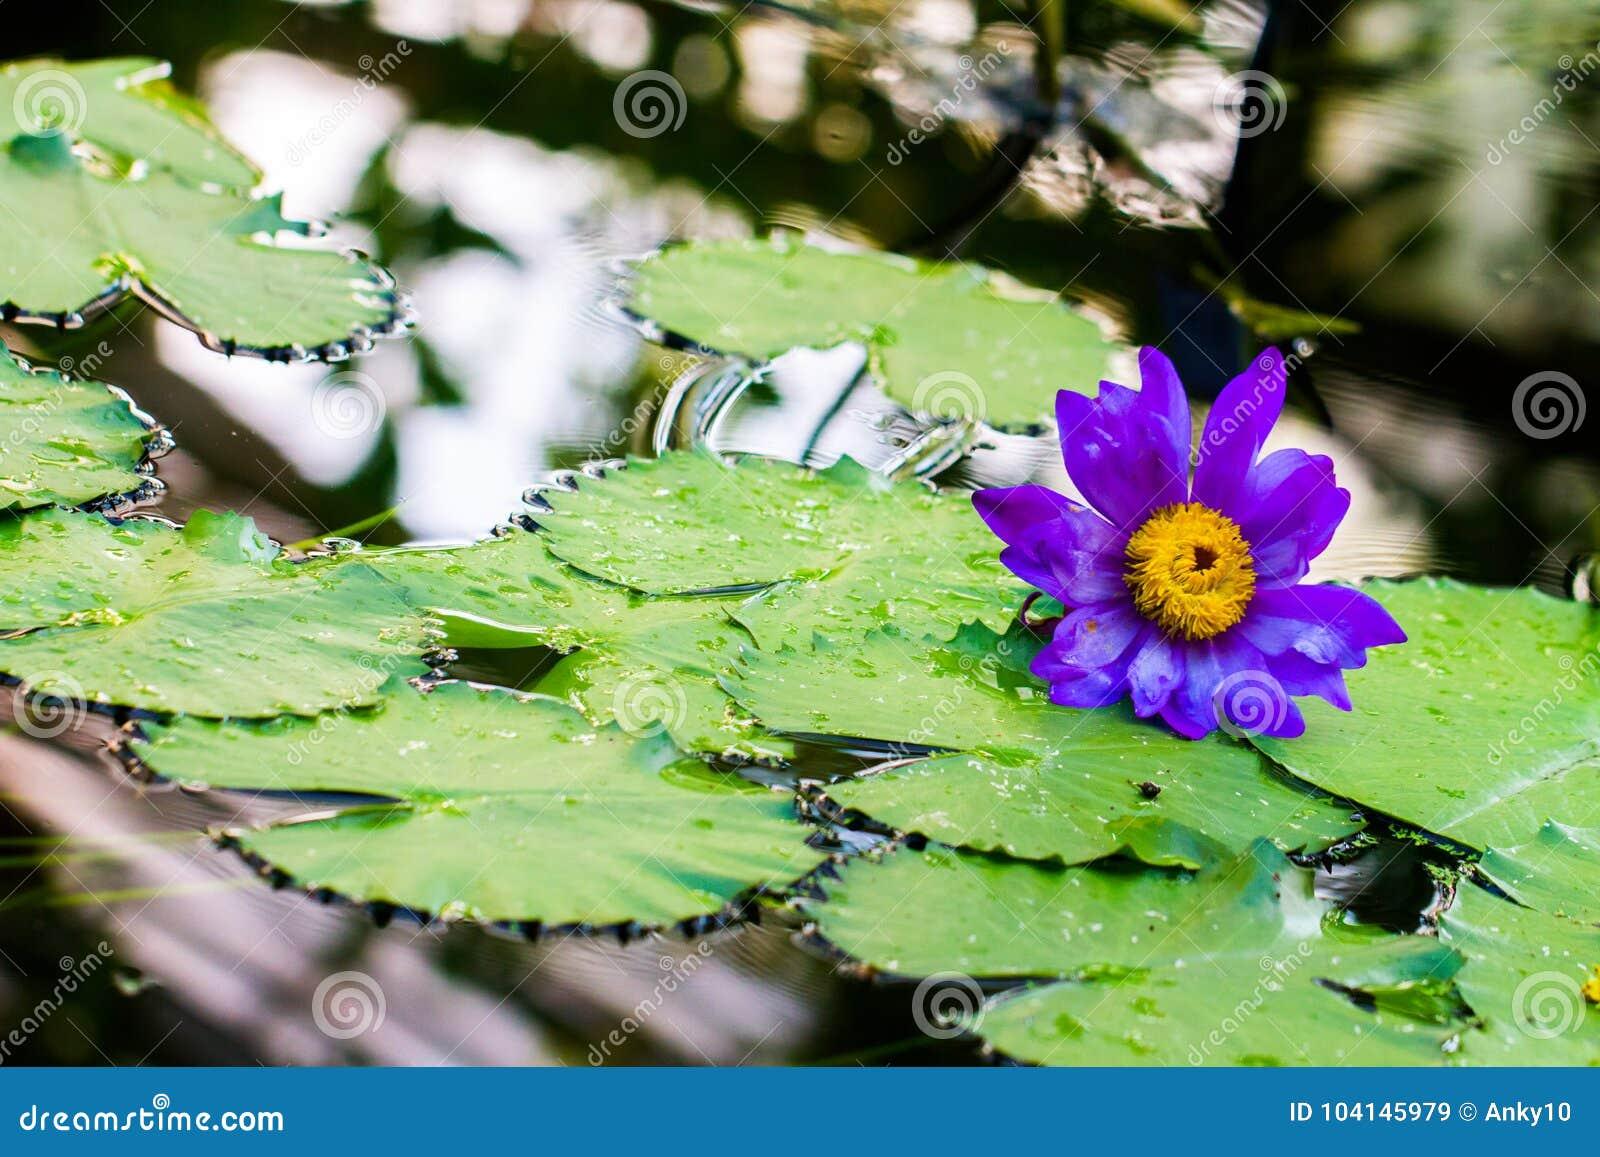 Blue egyptian lotus on pond stock image image of egyptian blossom blue egyptian lotus on pond izmirmasajfo